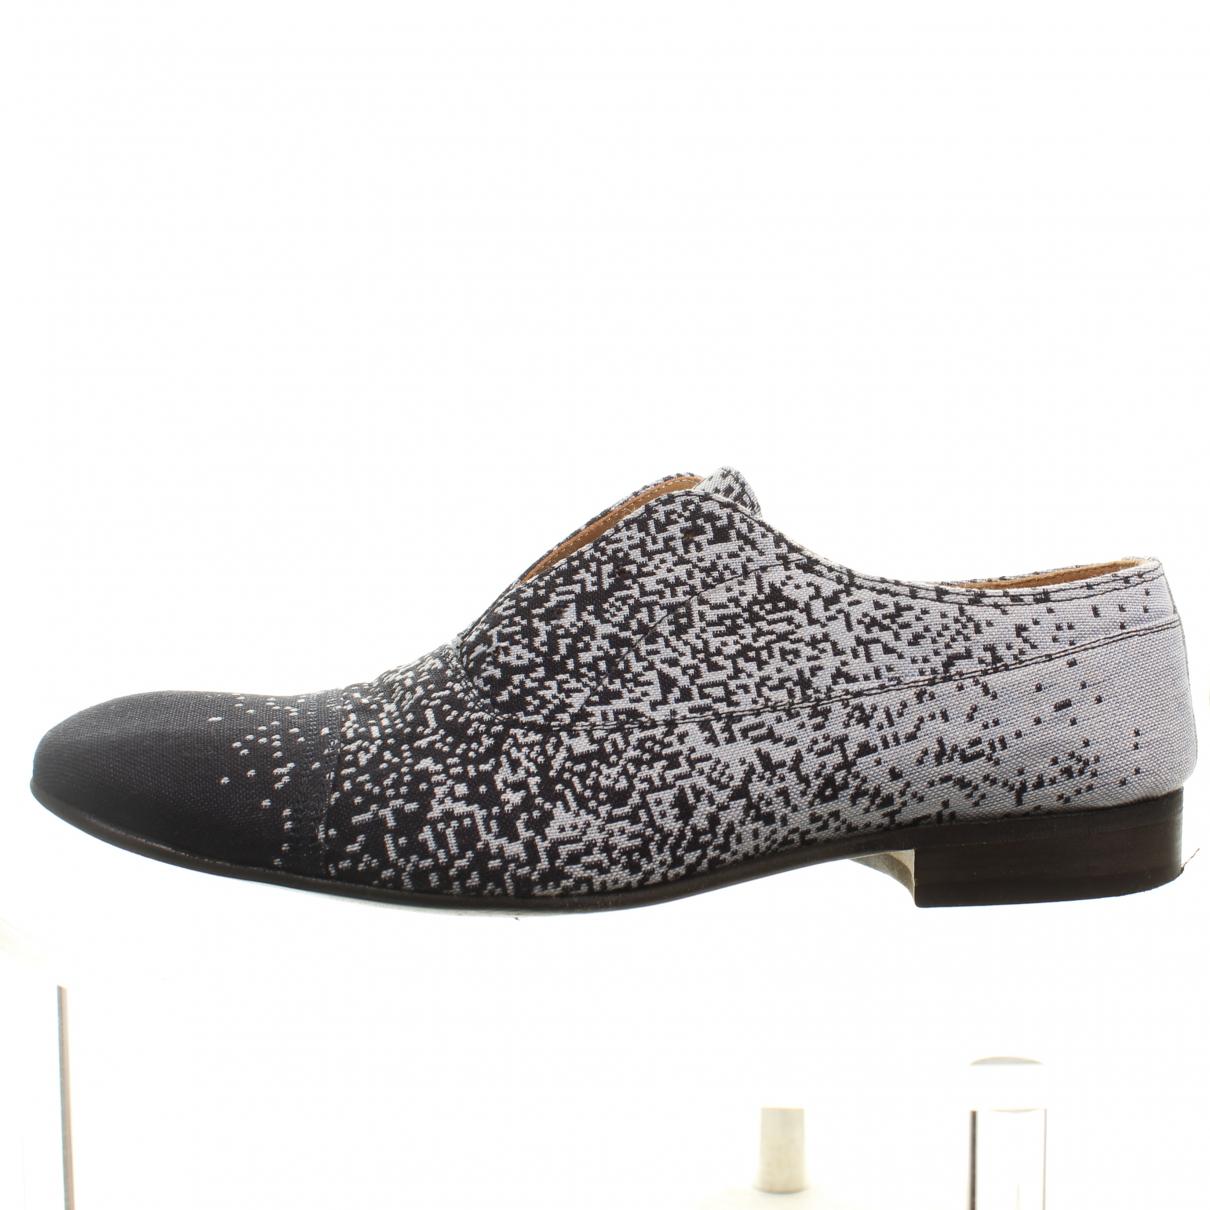 Maison Martin Margiela N Orange Cloth Sandals for Men 7 UK